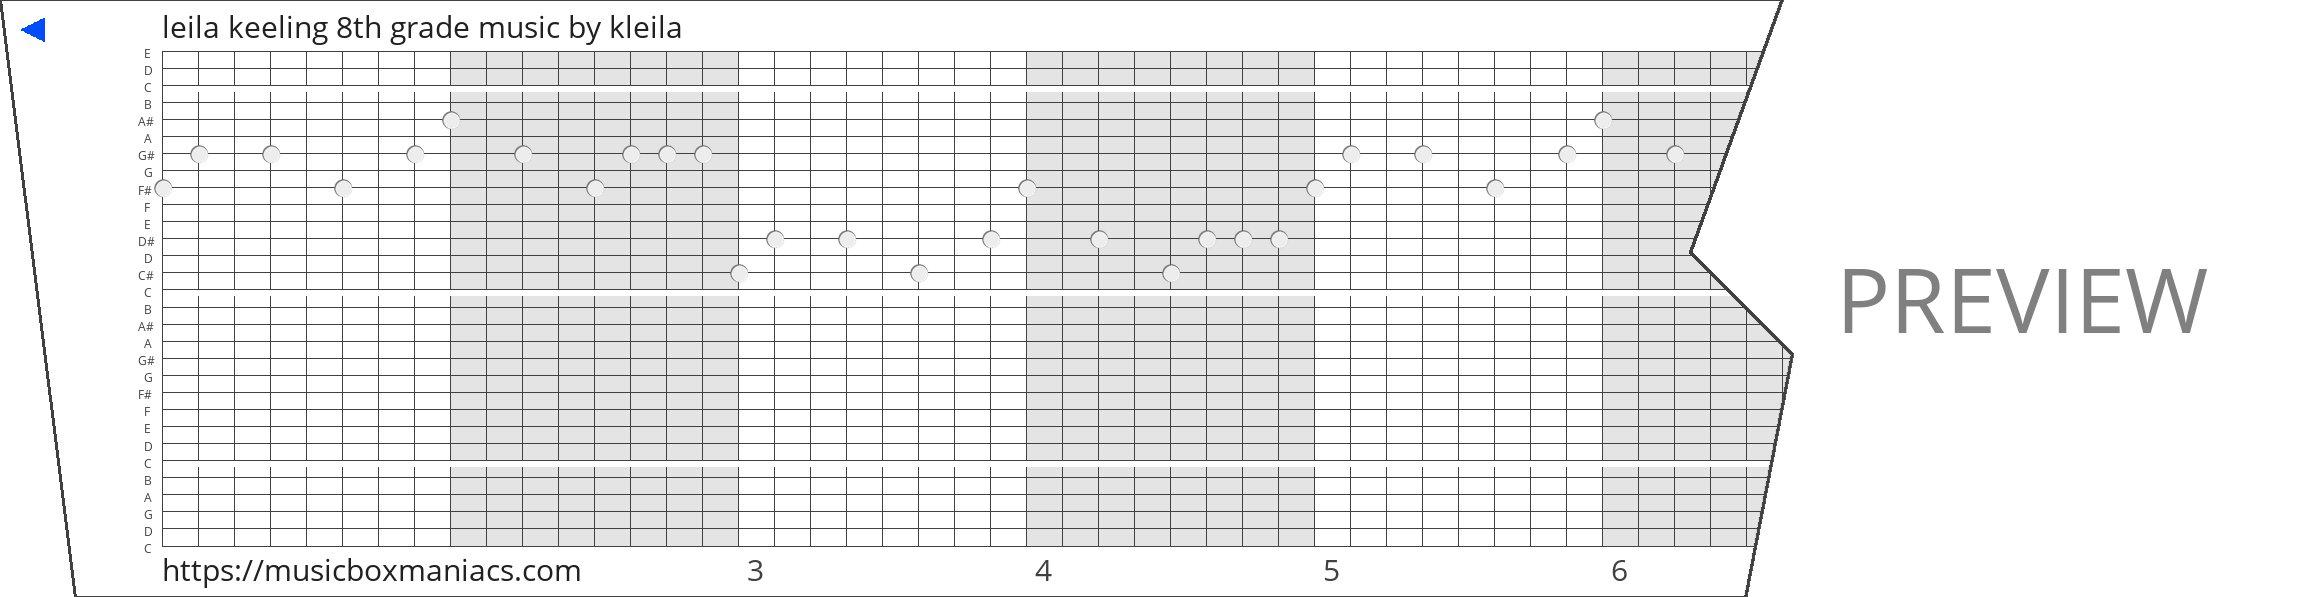 leila keeling 8th grade music 30 note music box paper strip